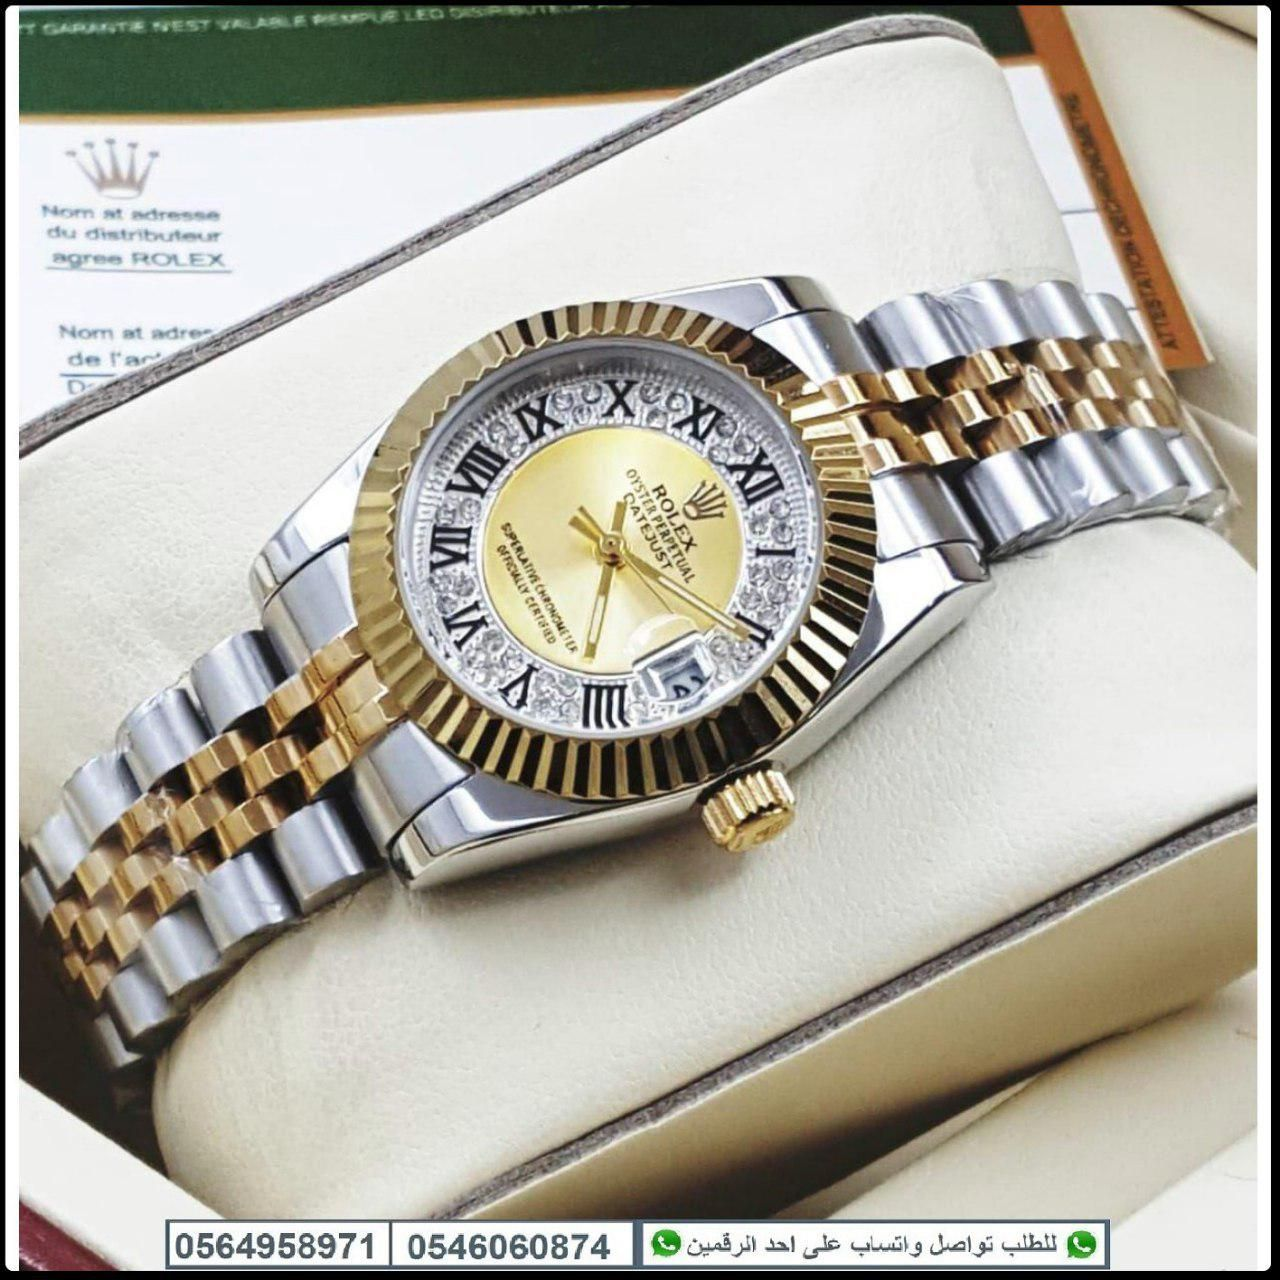 ساعات رولكس رجالي Rolex درجه اولى مع علبه مخمل و كرت الماركه هدايا هنوف Kors Watches Bracelet Watch Michael Kors Watch